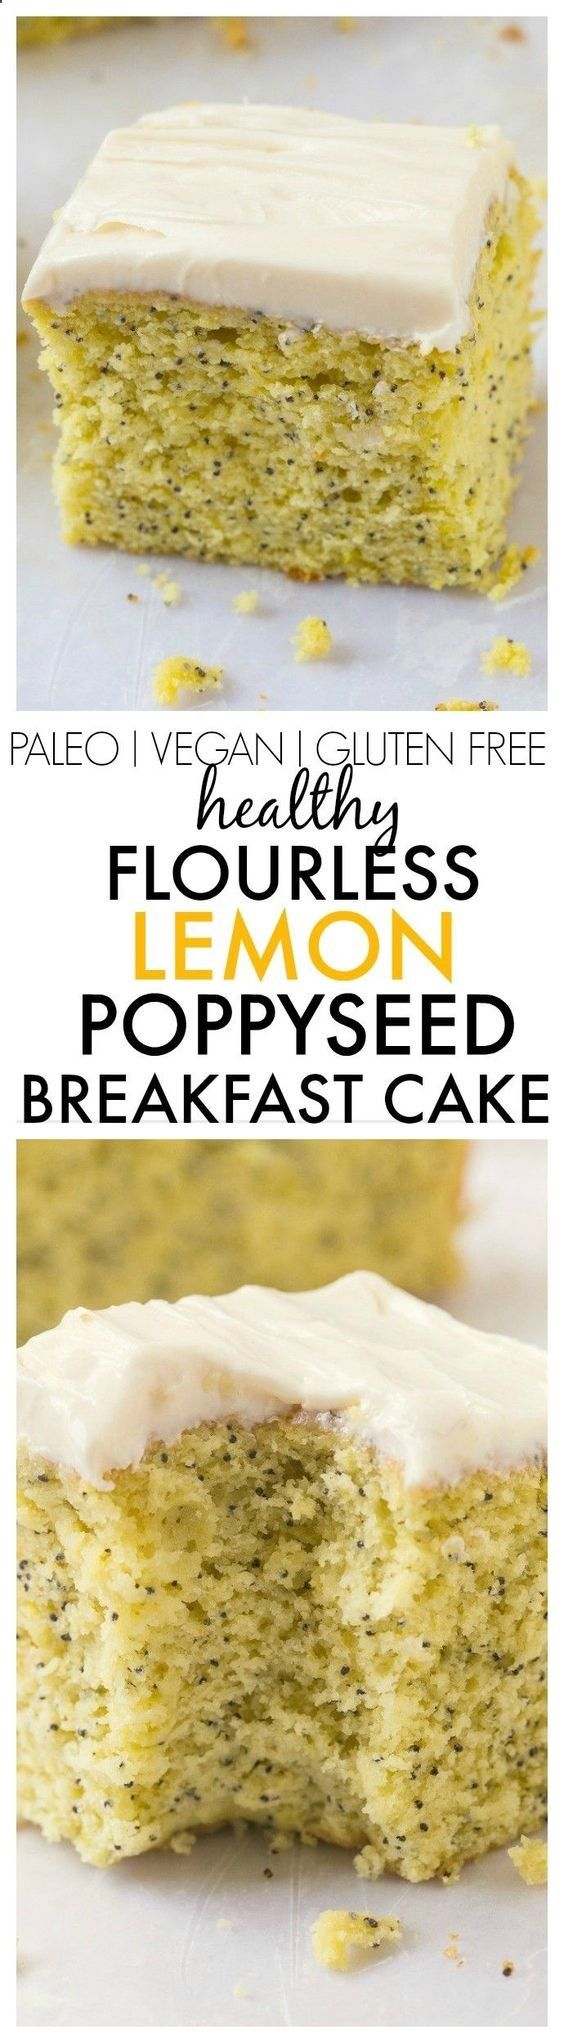 Healthy Flourless Lemon Poppy Seed Breakfast Cake  | thebigmansworld.com